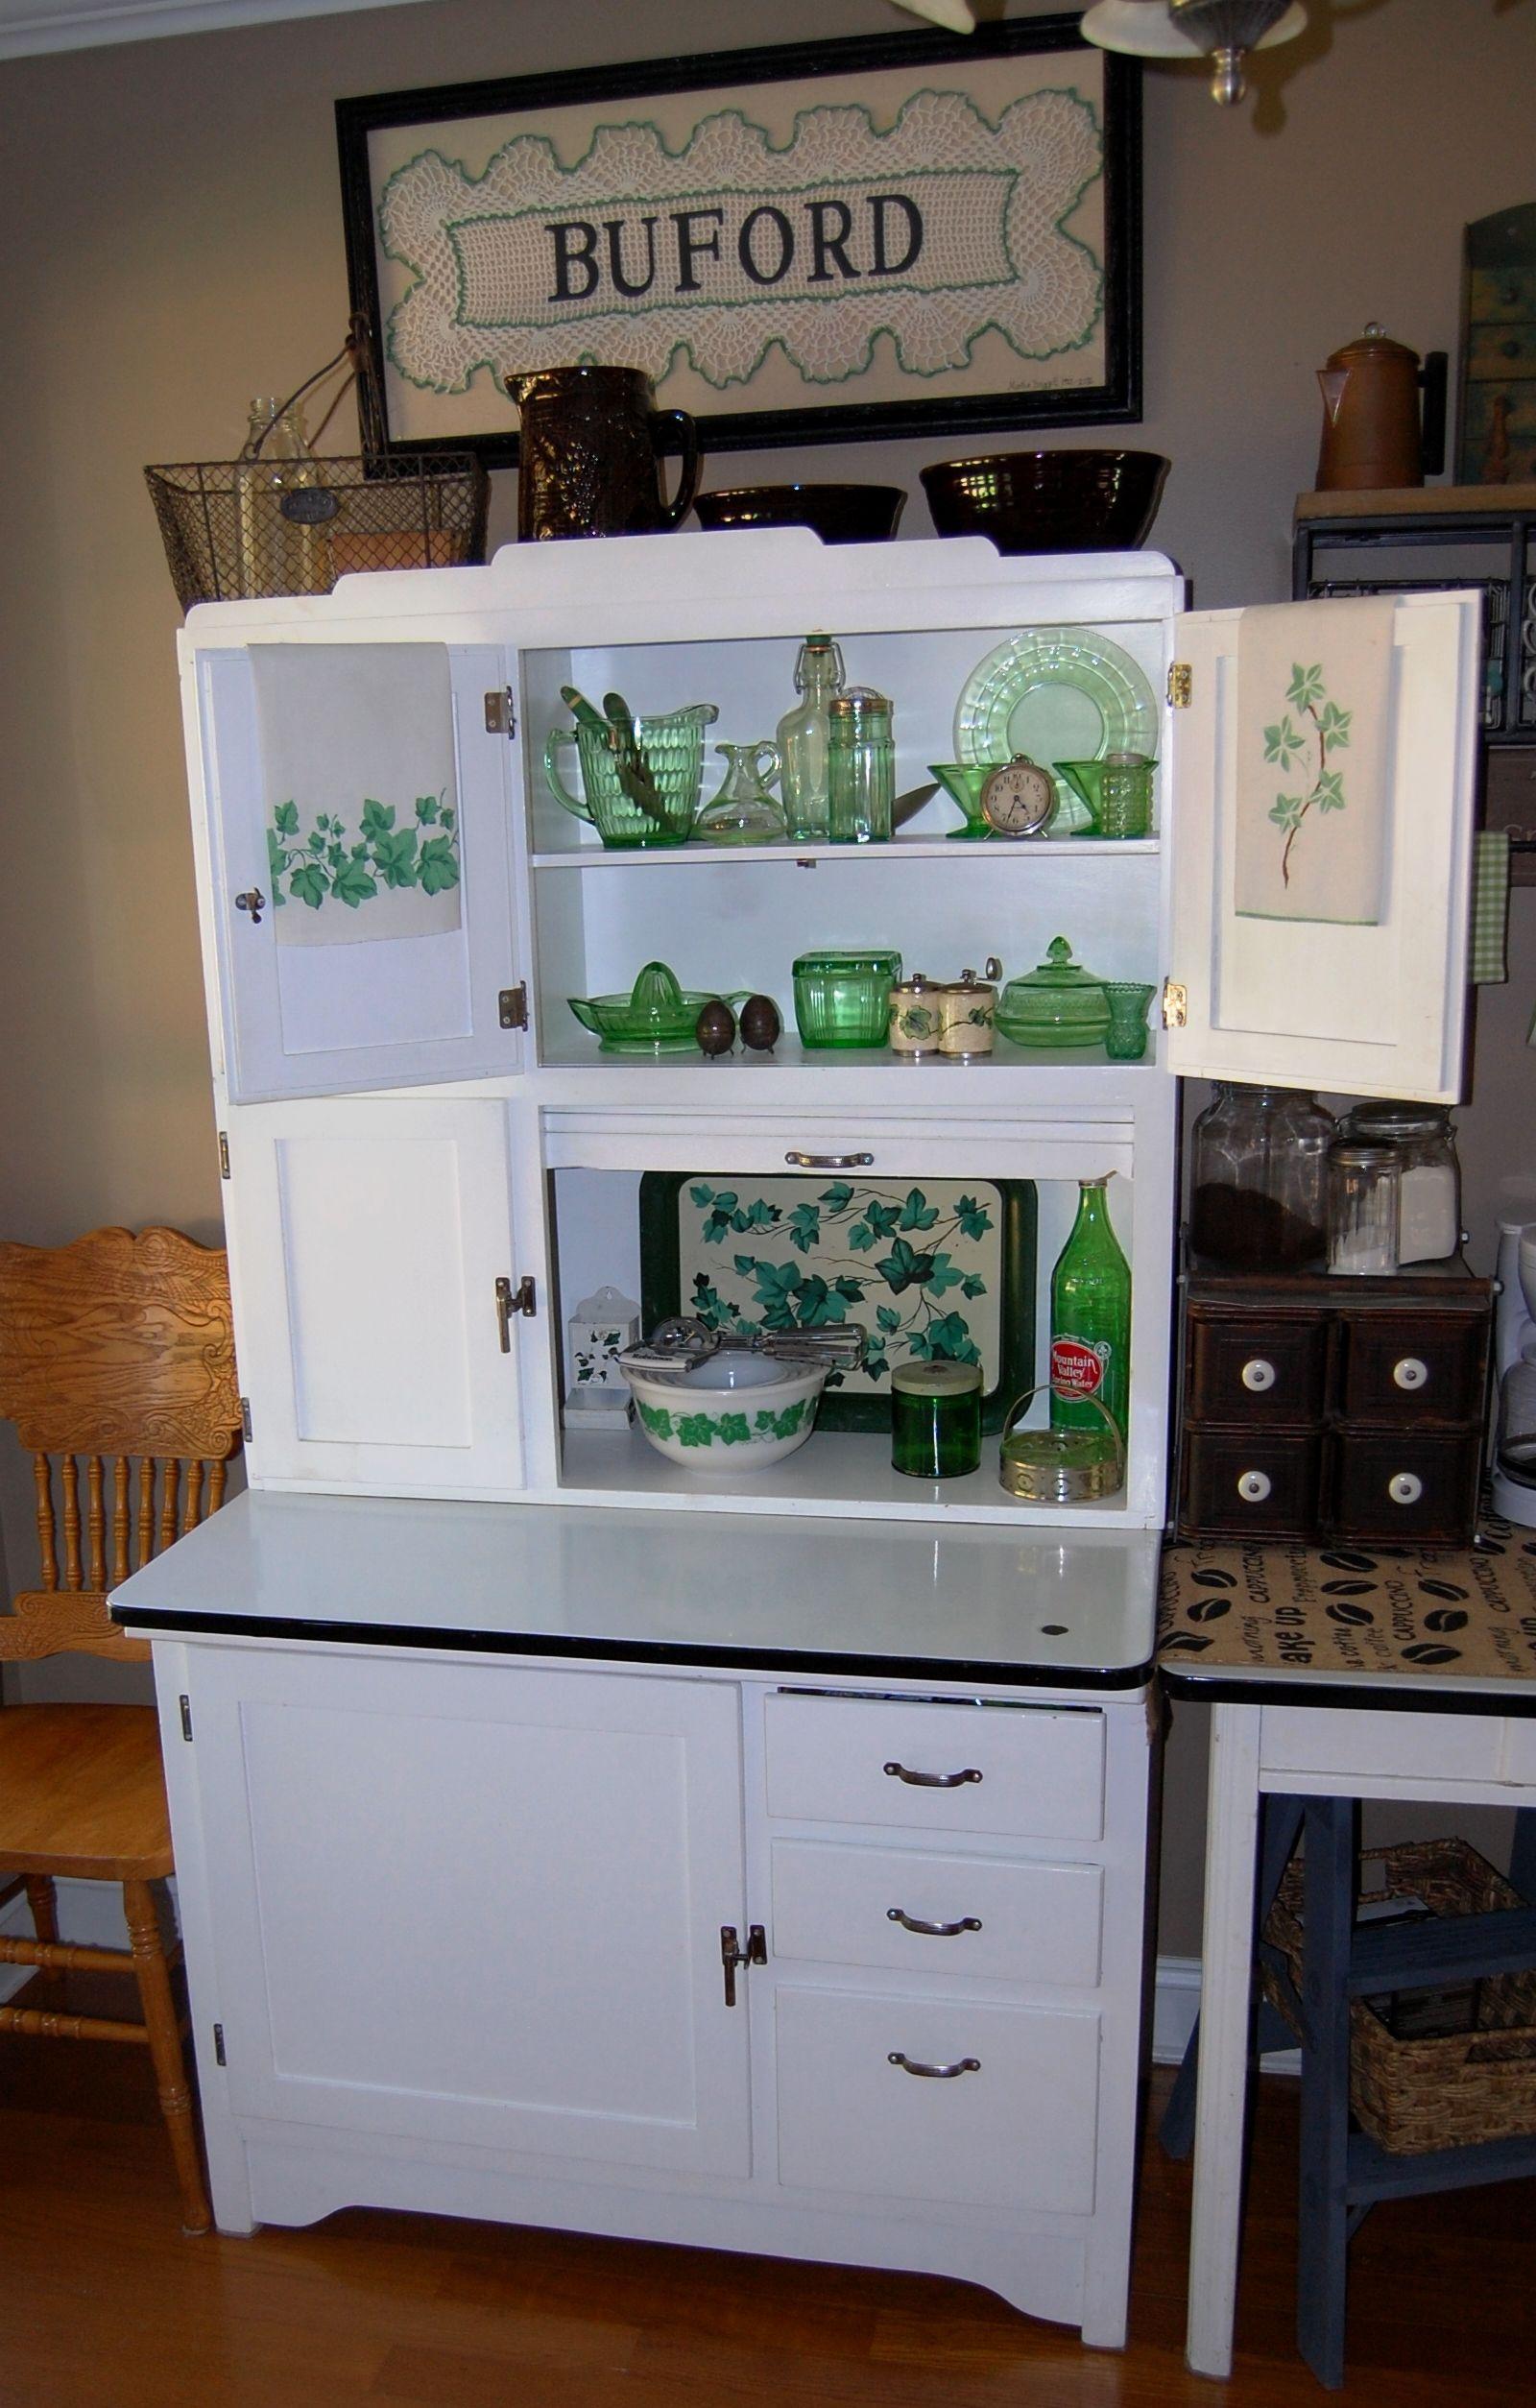 Best Kitchen Gallery: My Grandmother S Hoosier Cabi Filled With Greenware Kitschy of Vintage Kitchen Cupboards on rachelxblog.com